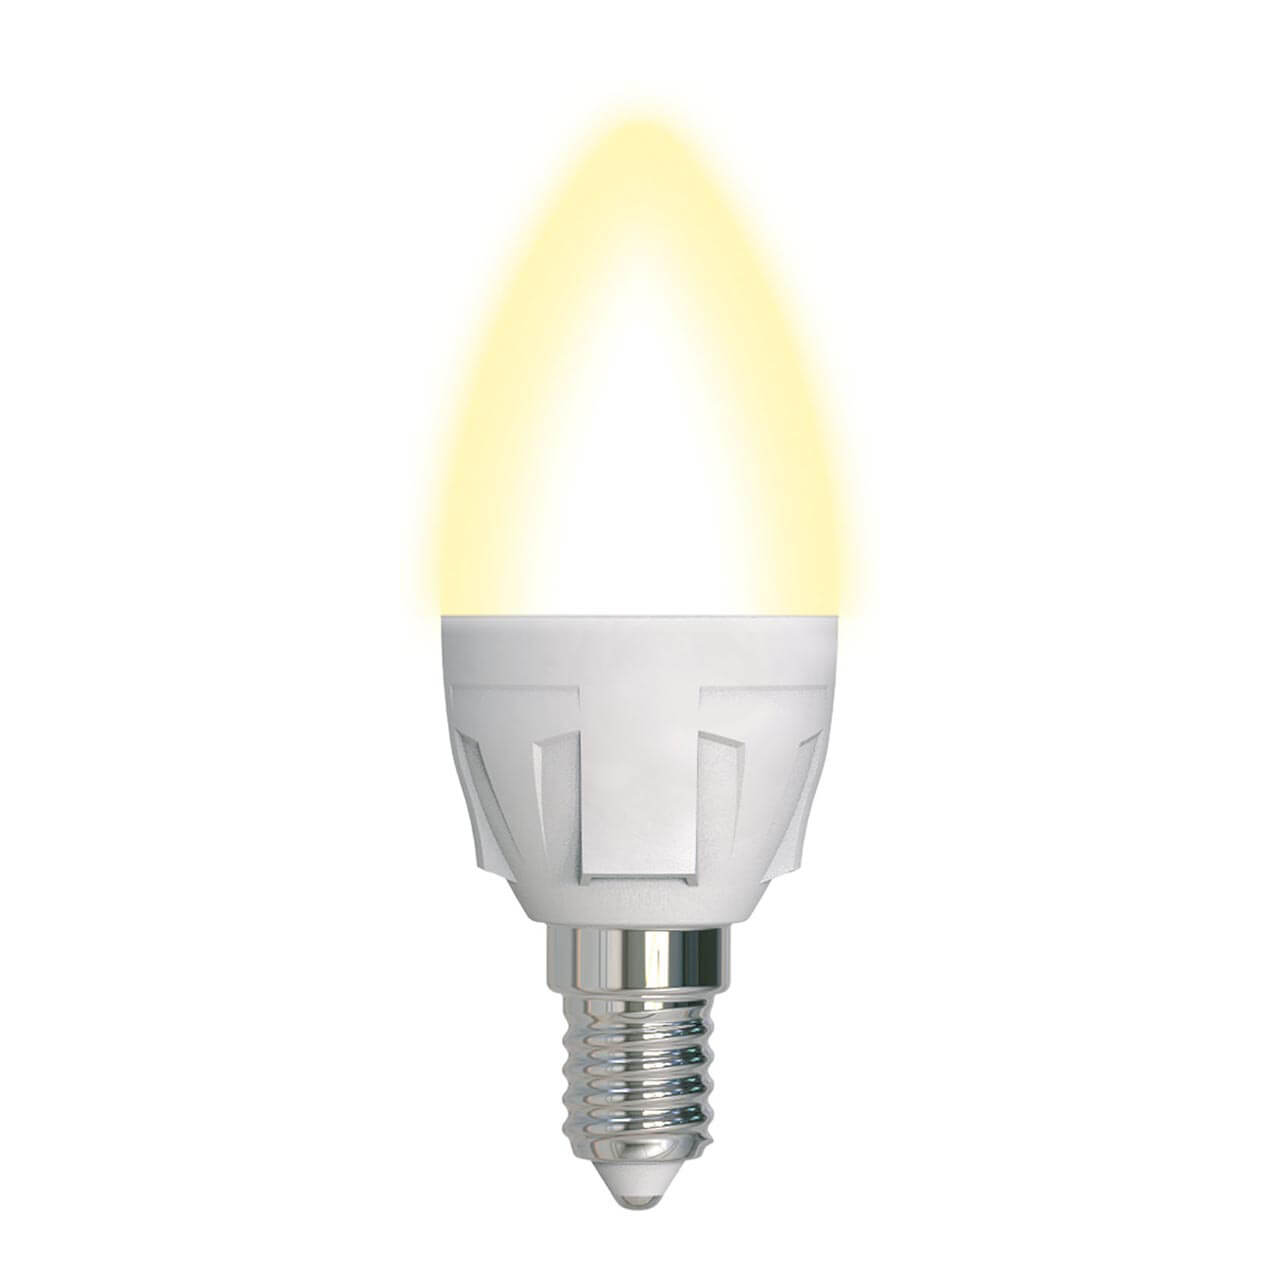 Лампа светодиодная диммируемая (UL-00004296) Uniel E14 7W 3000K матовая LED-C37 7W/3000K/E14/FR/DIM PLP01WH цена и фото